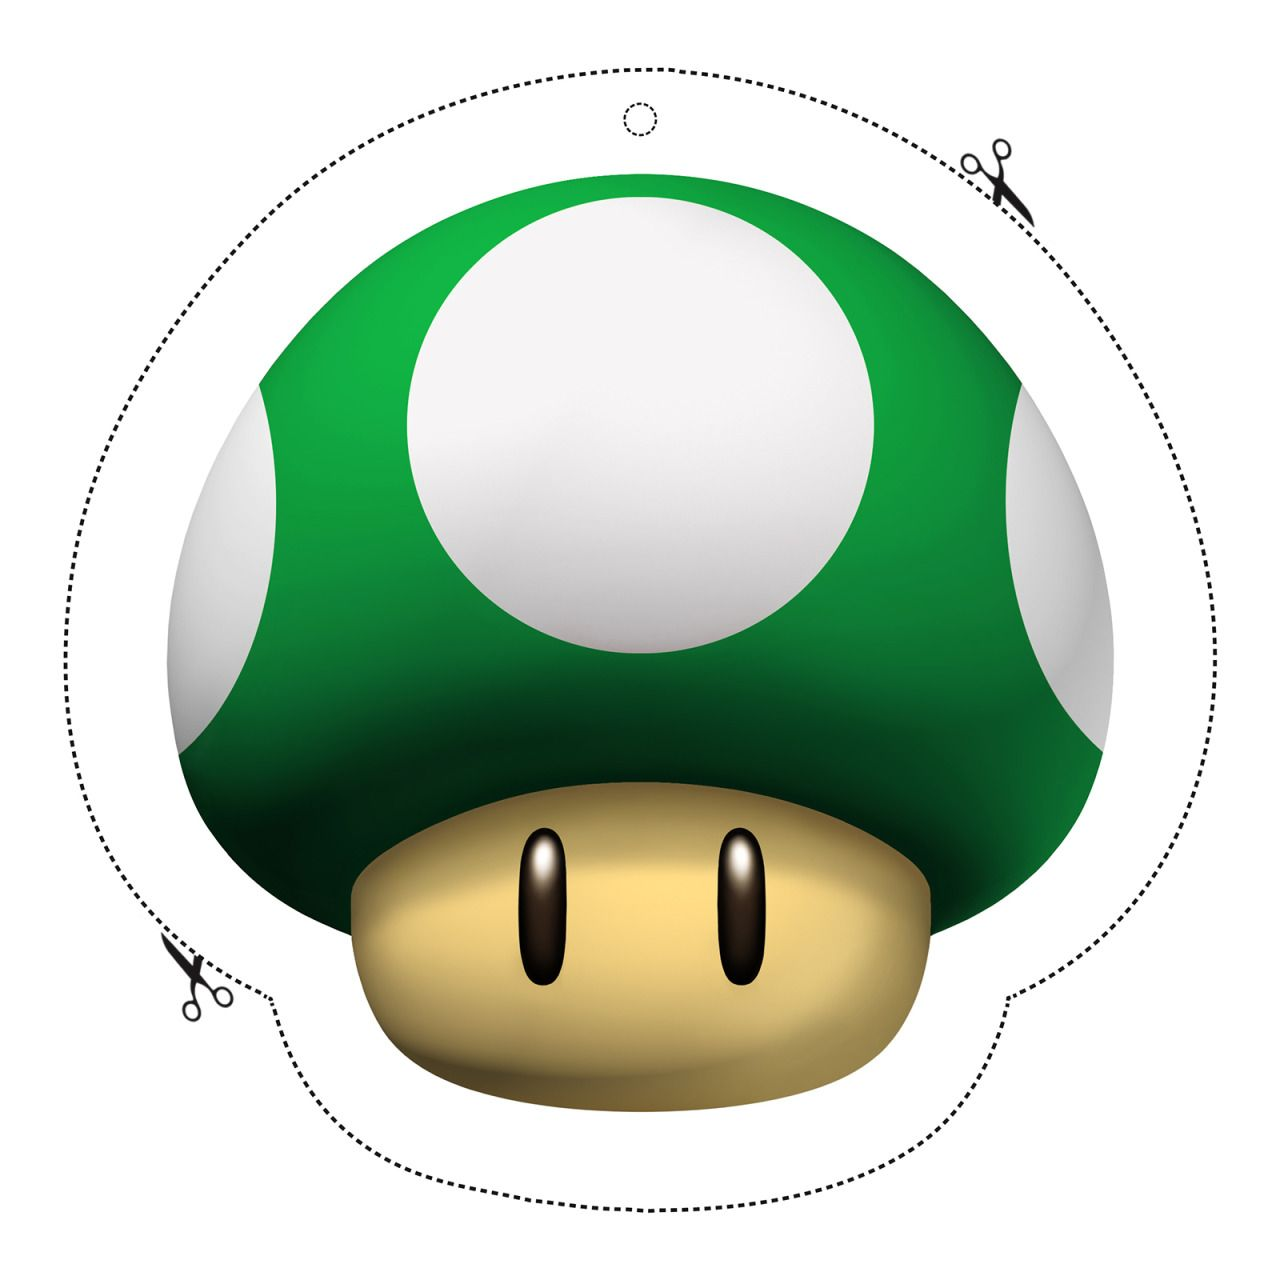 62 Bit Gaming Nintendo S Facebook Just Posted A Bunch Of Last Super Mario Bros Party Super Mario Bros Birthday Party Mario Bros Party